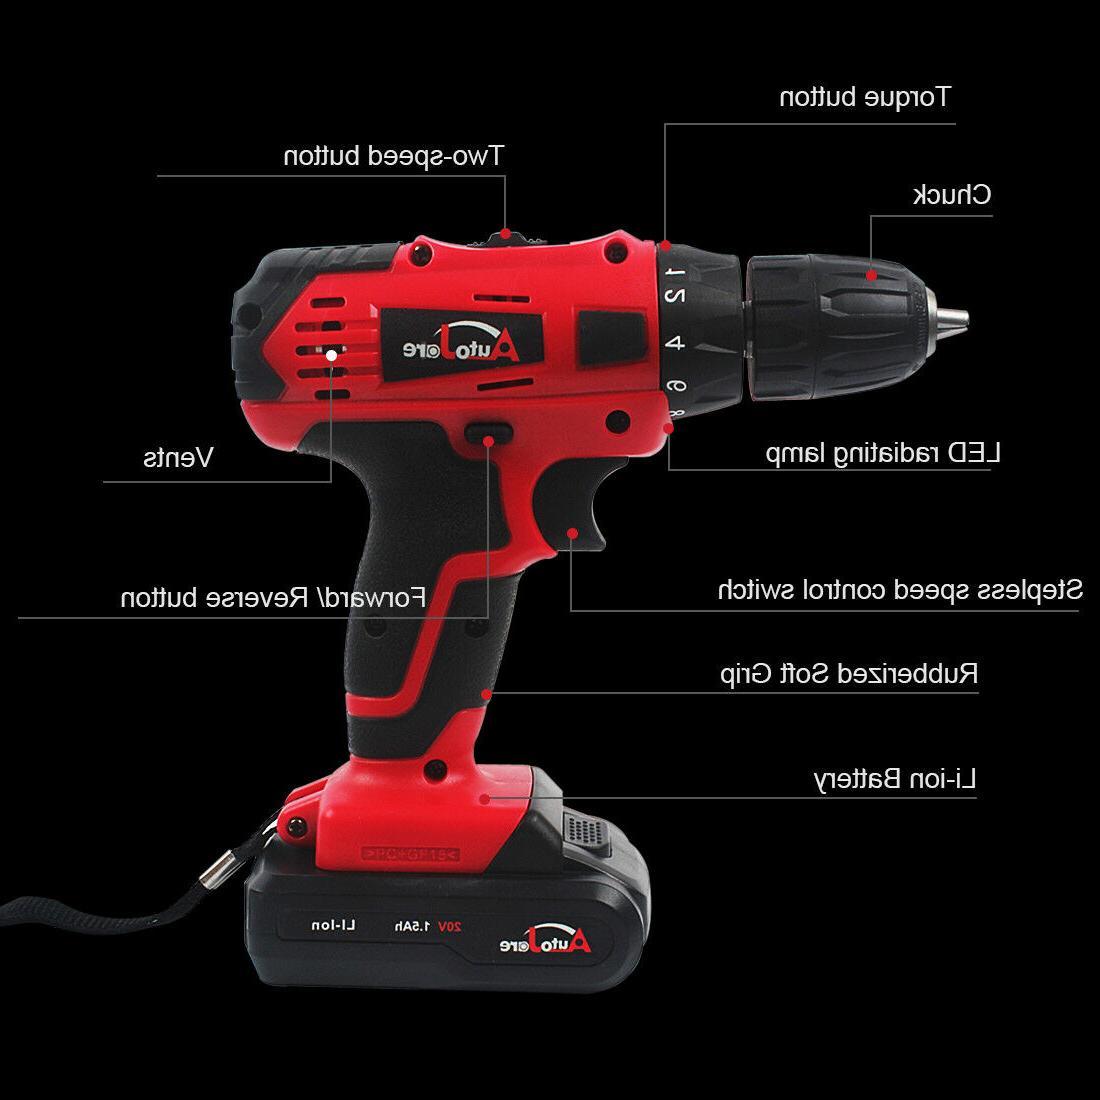 Portable Cordless Electric Kit Tool Repair 18v max